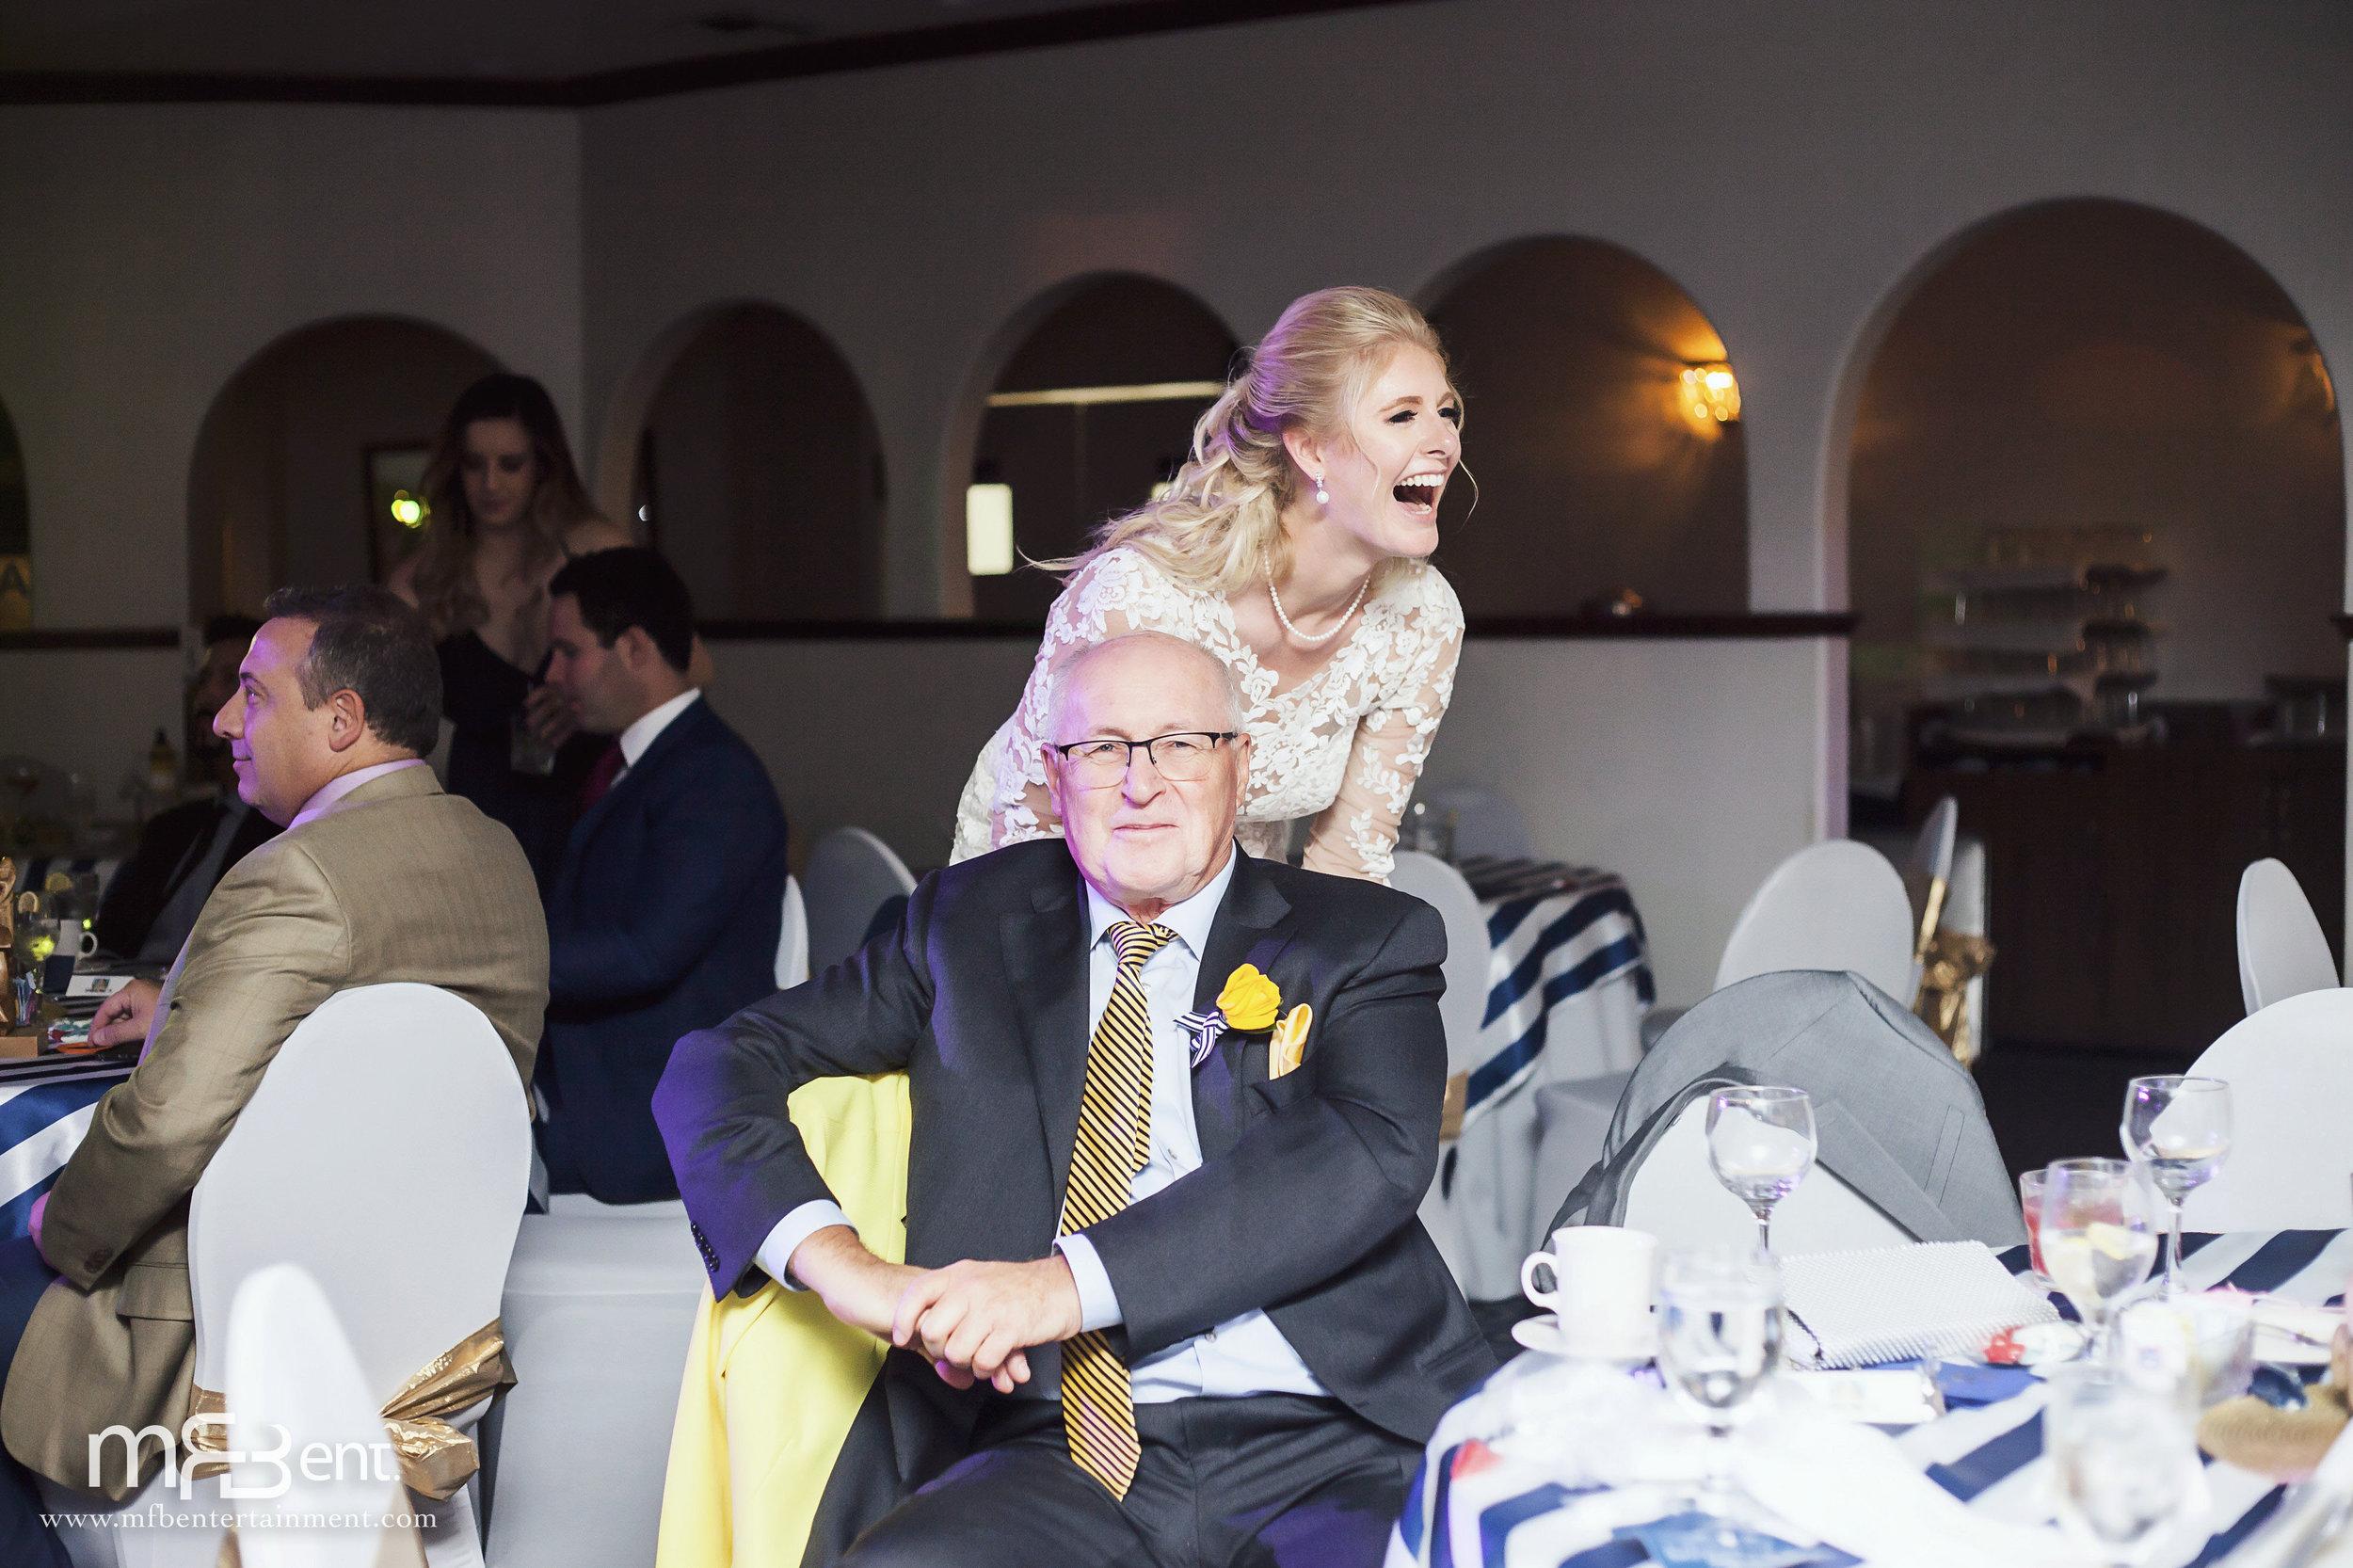 PIOTR CHELSEA WEDDING-RECEPTION-0213 L.jpg